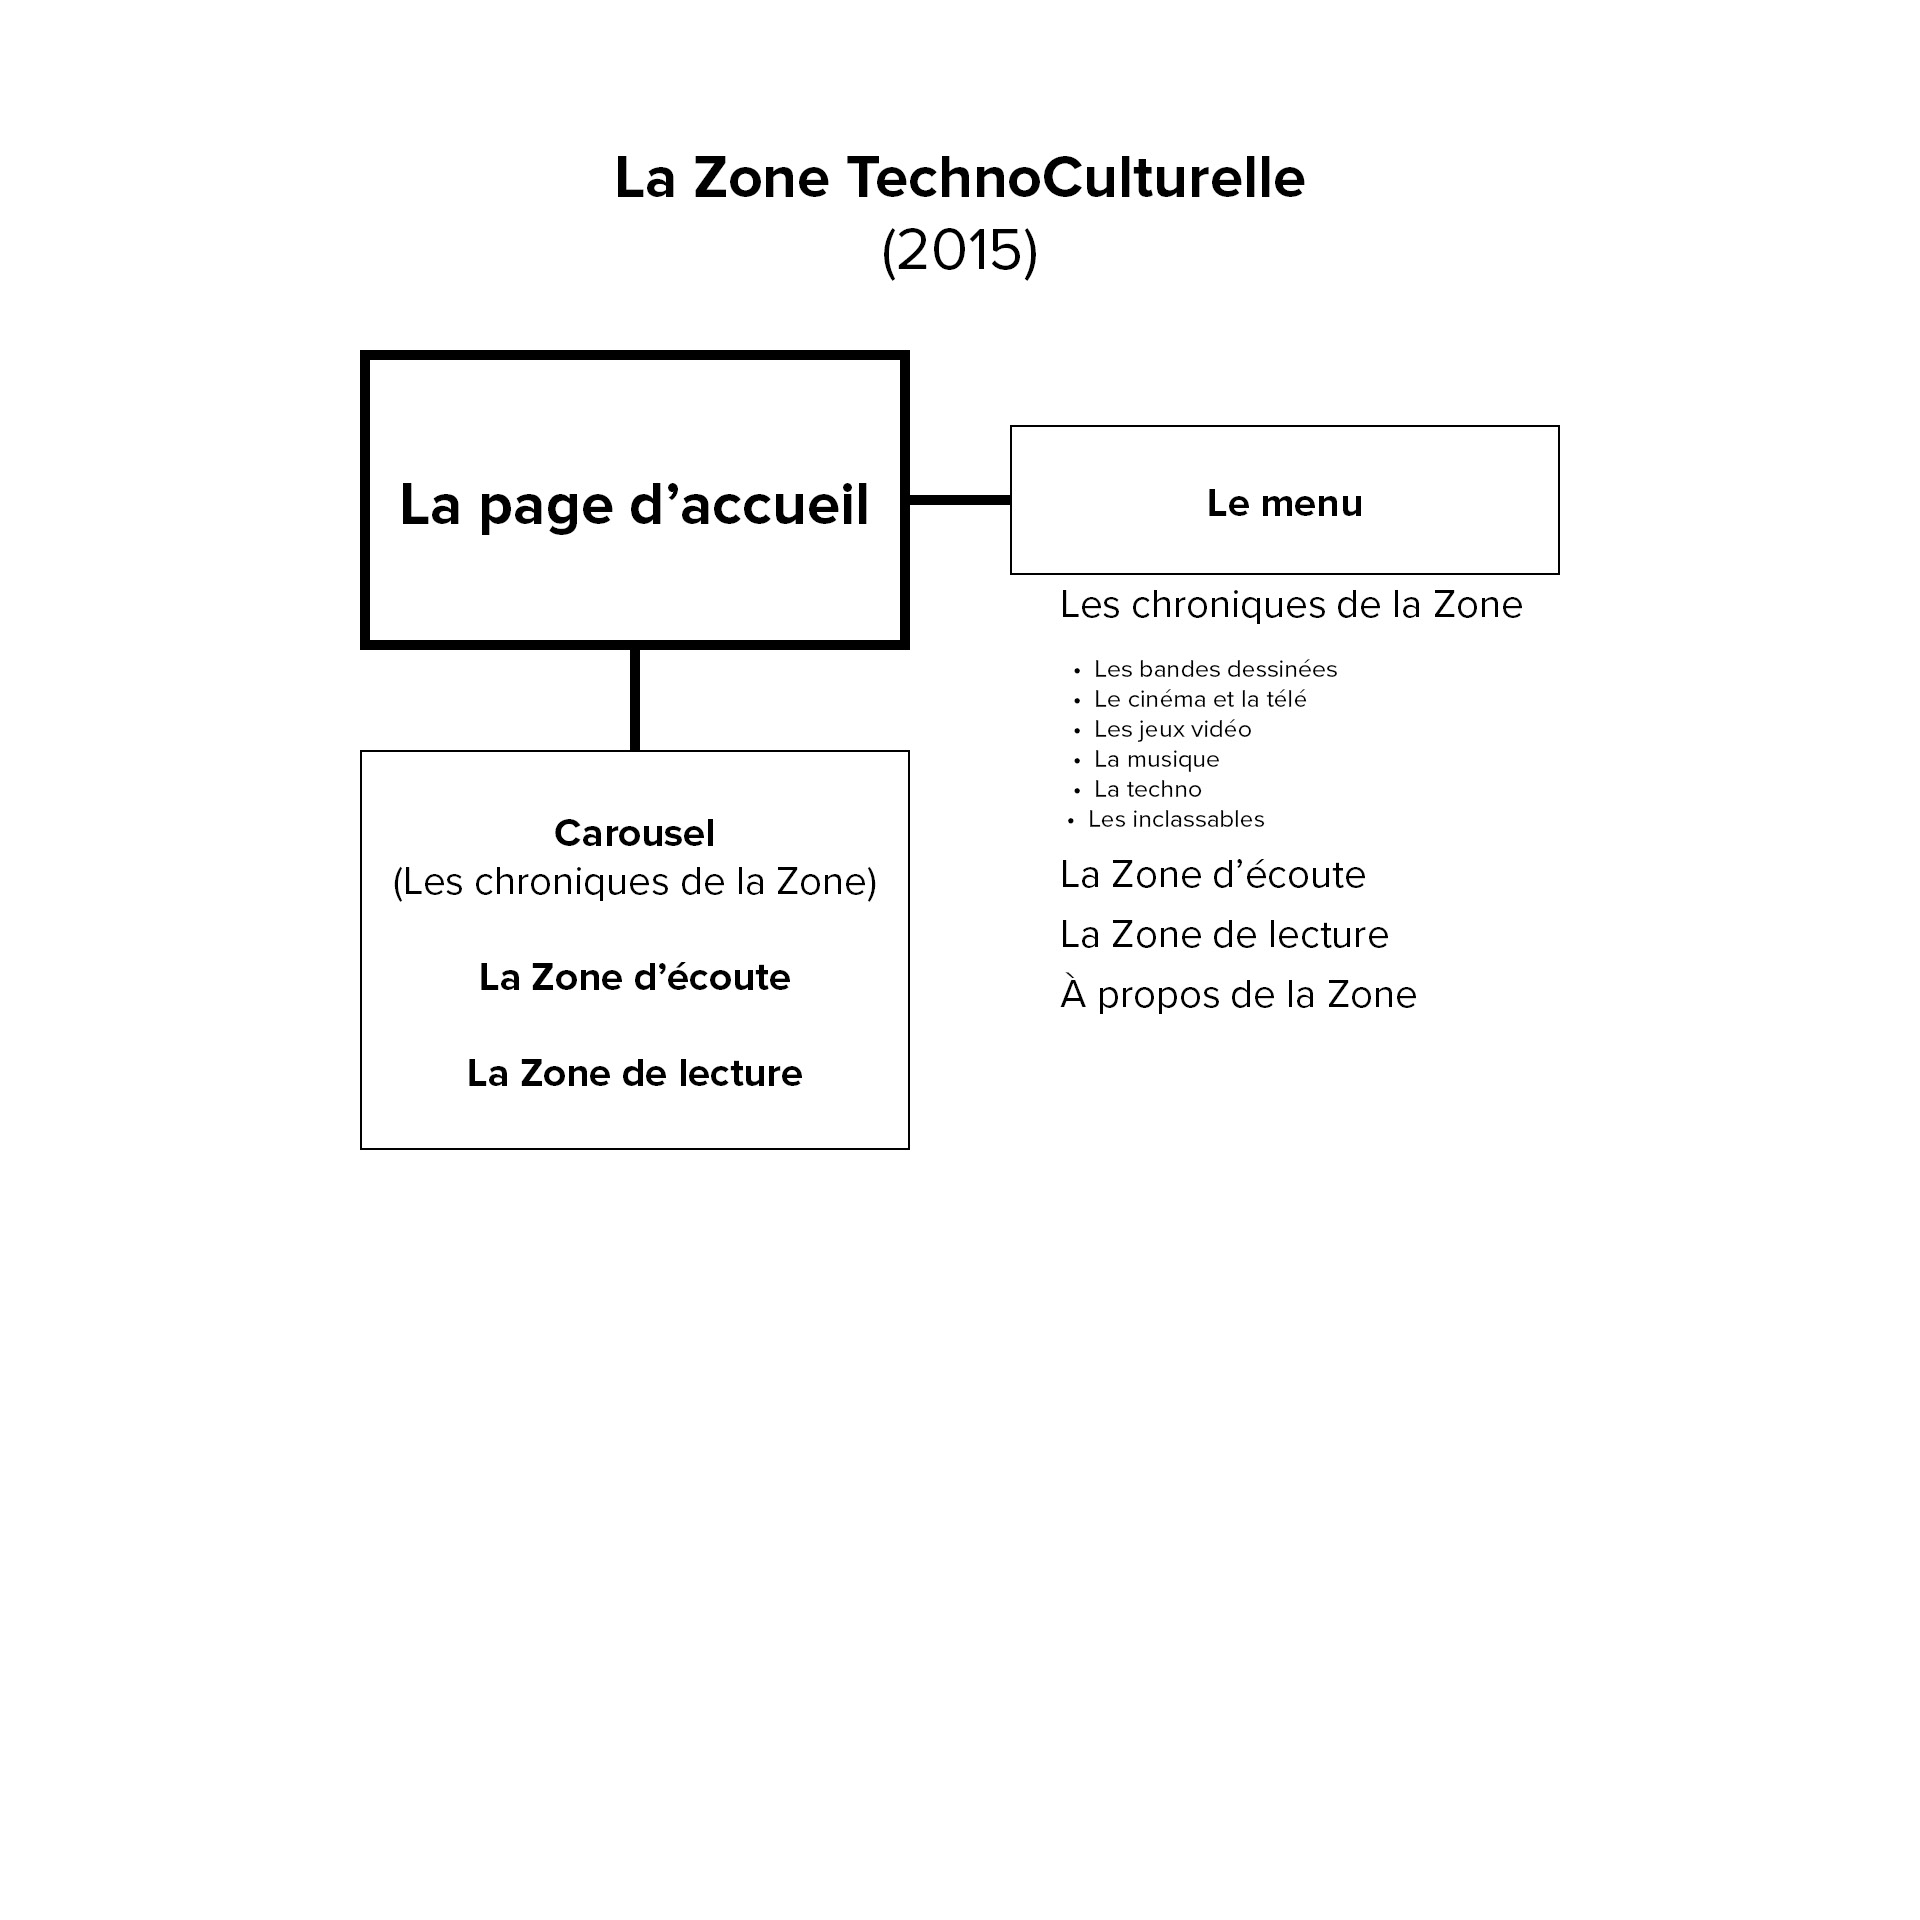 ZTC 2015